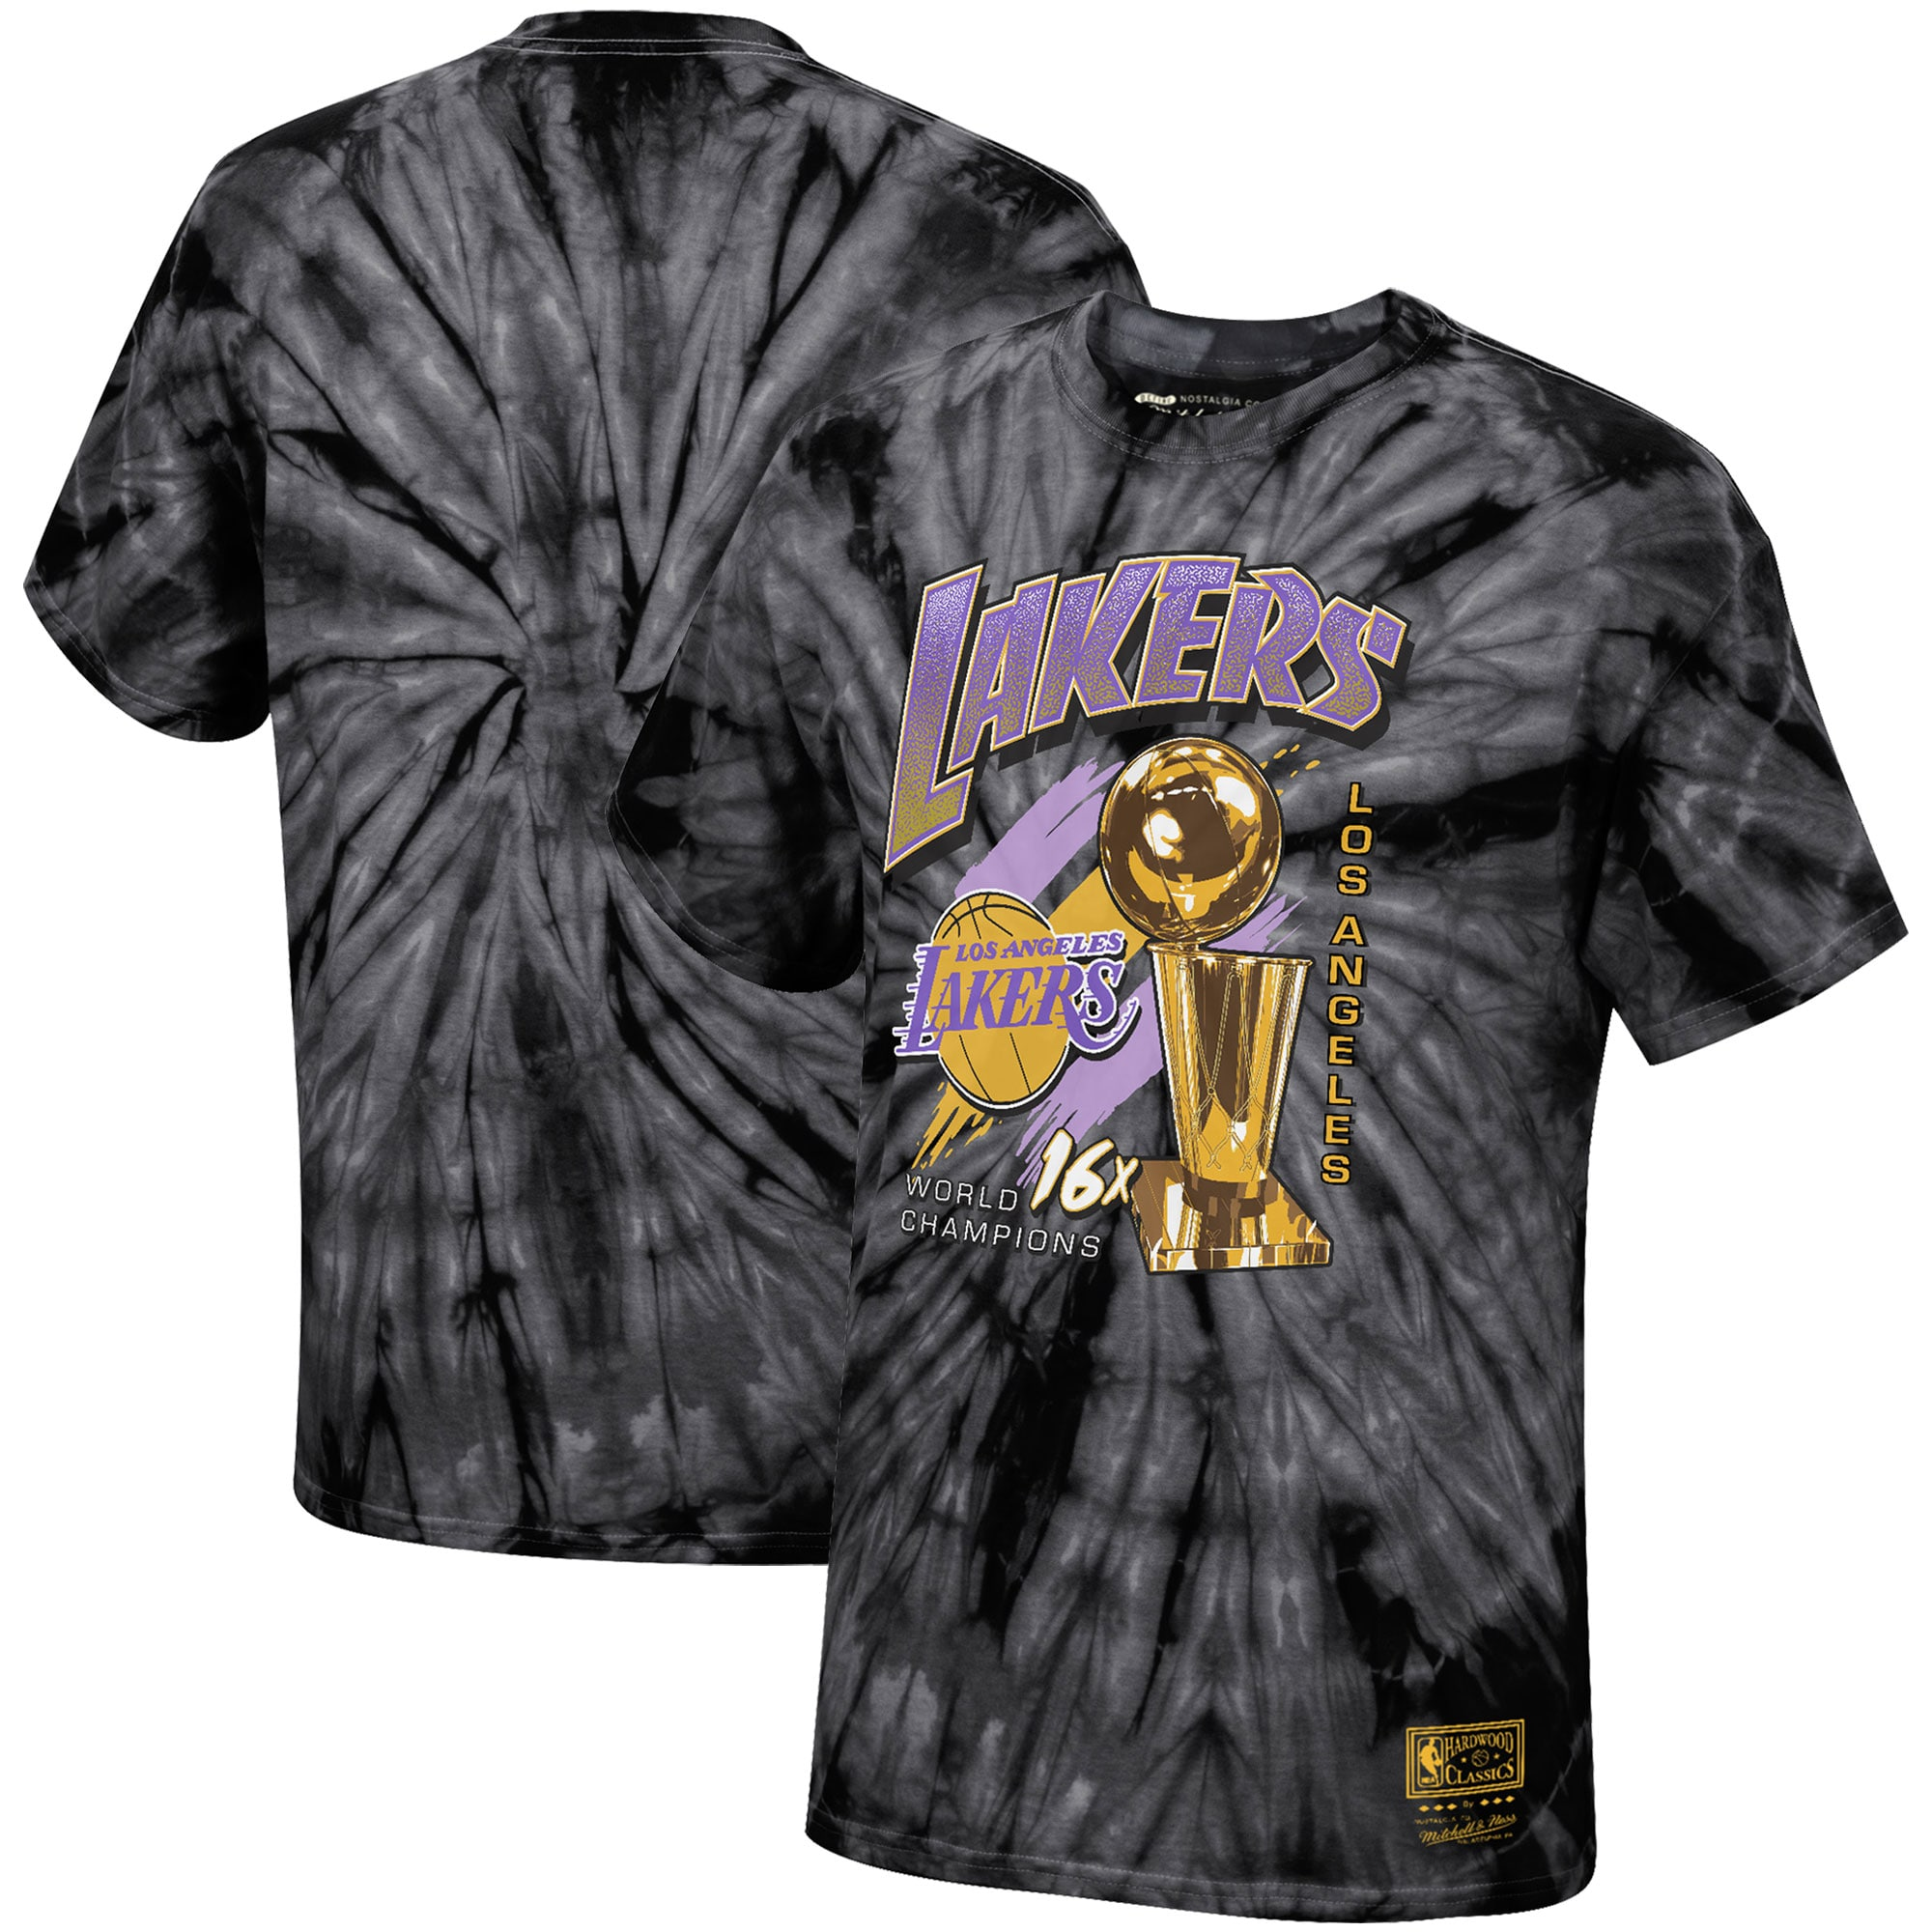 Los Angeles Lakers Mitchell & Ness Hardwood Classics Streak of Championships T-Shirt - Black